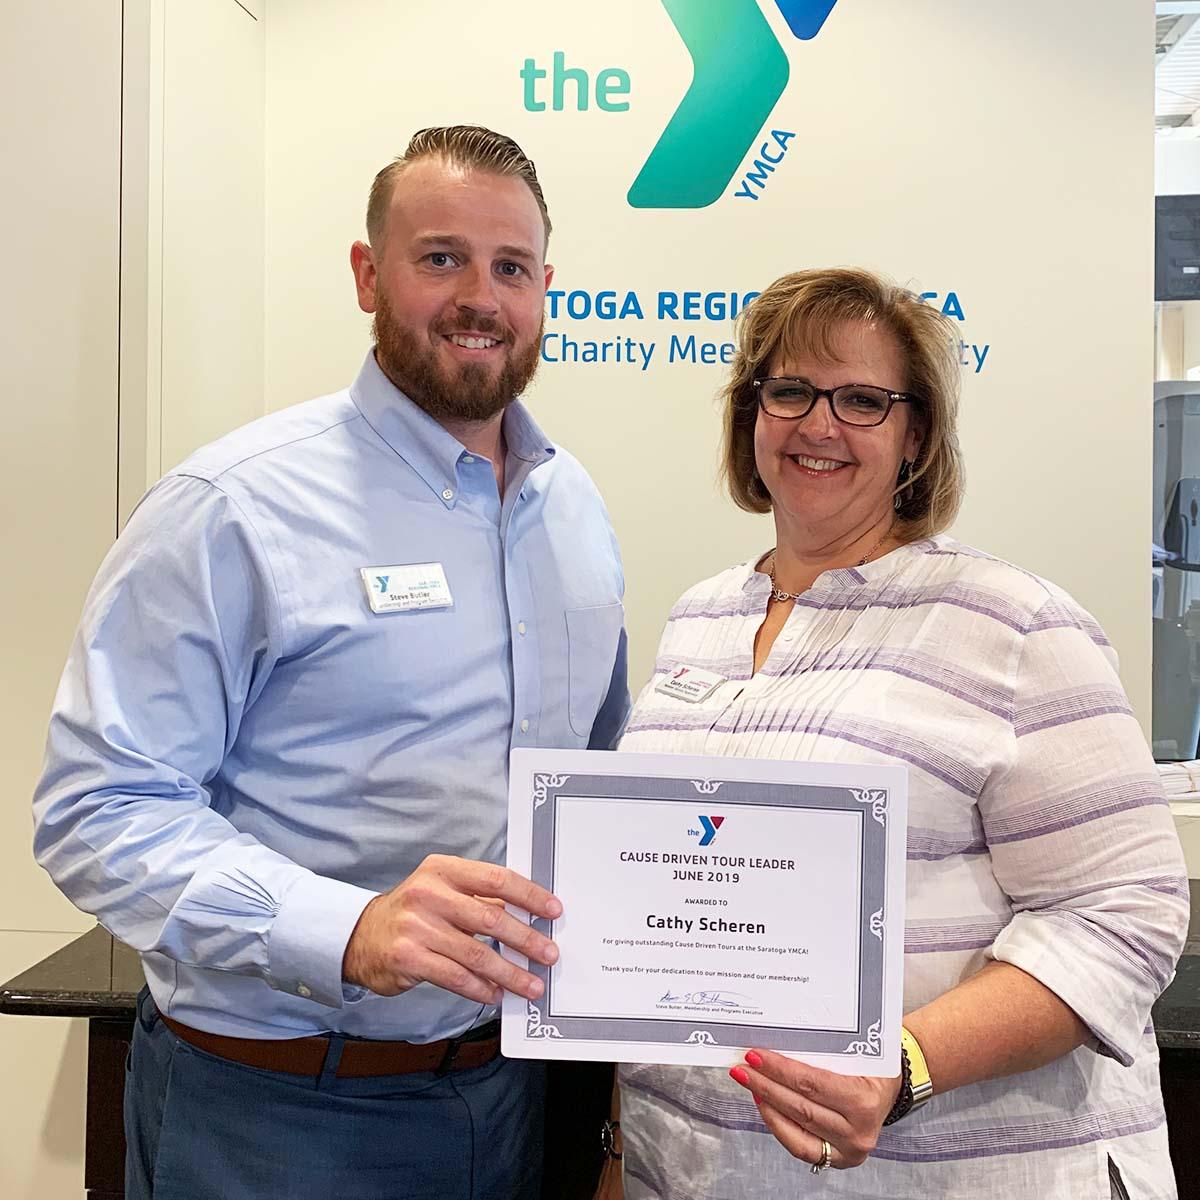 Malta Branch - Saratoga Regional YMCA